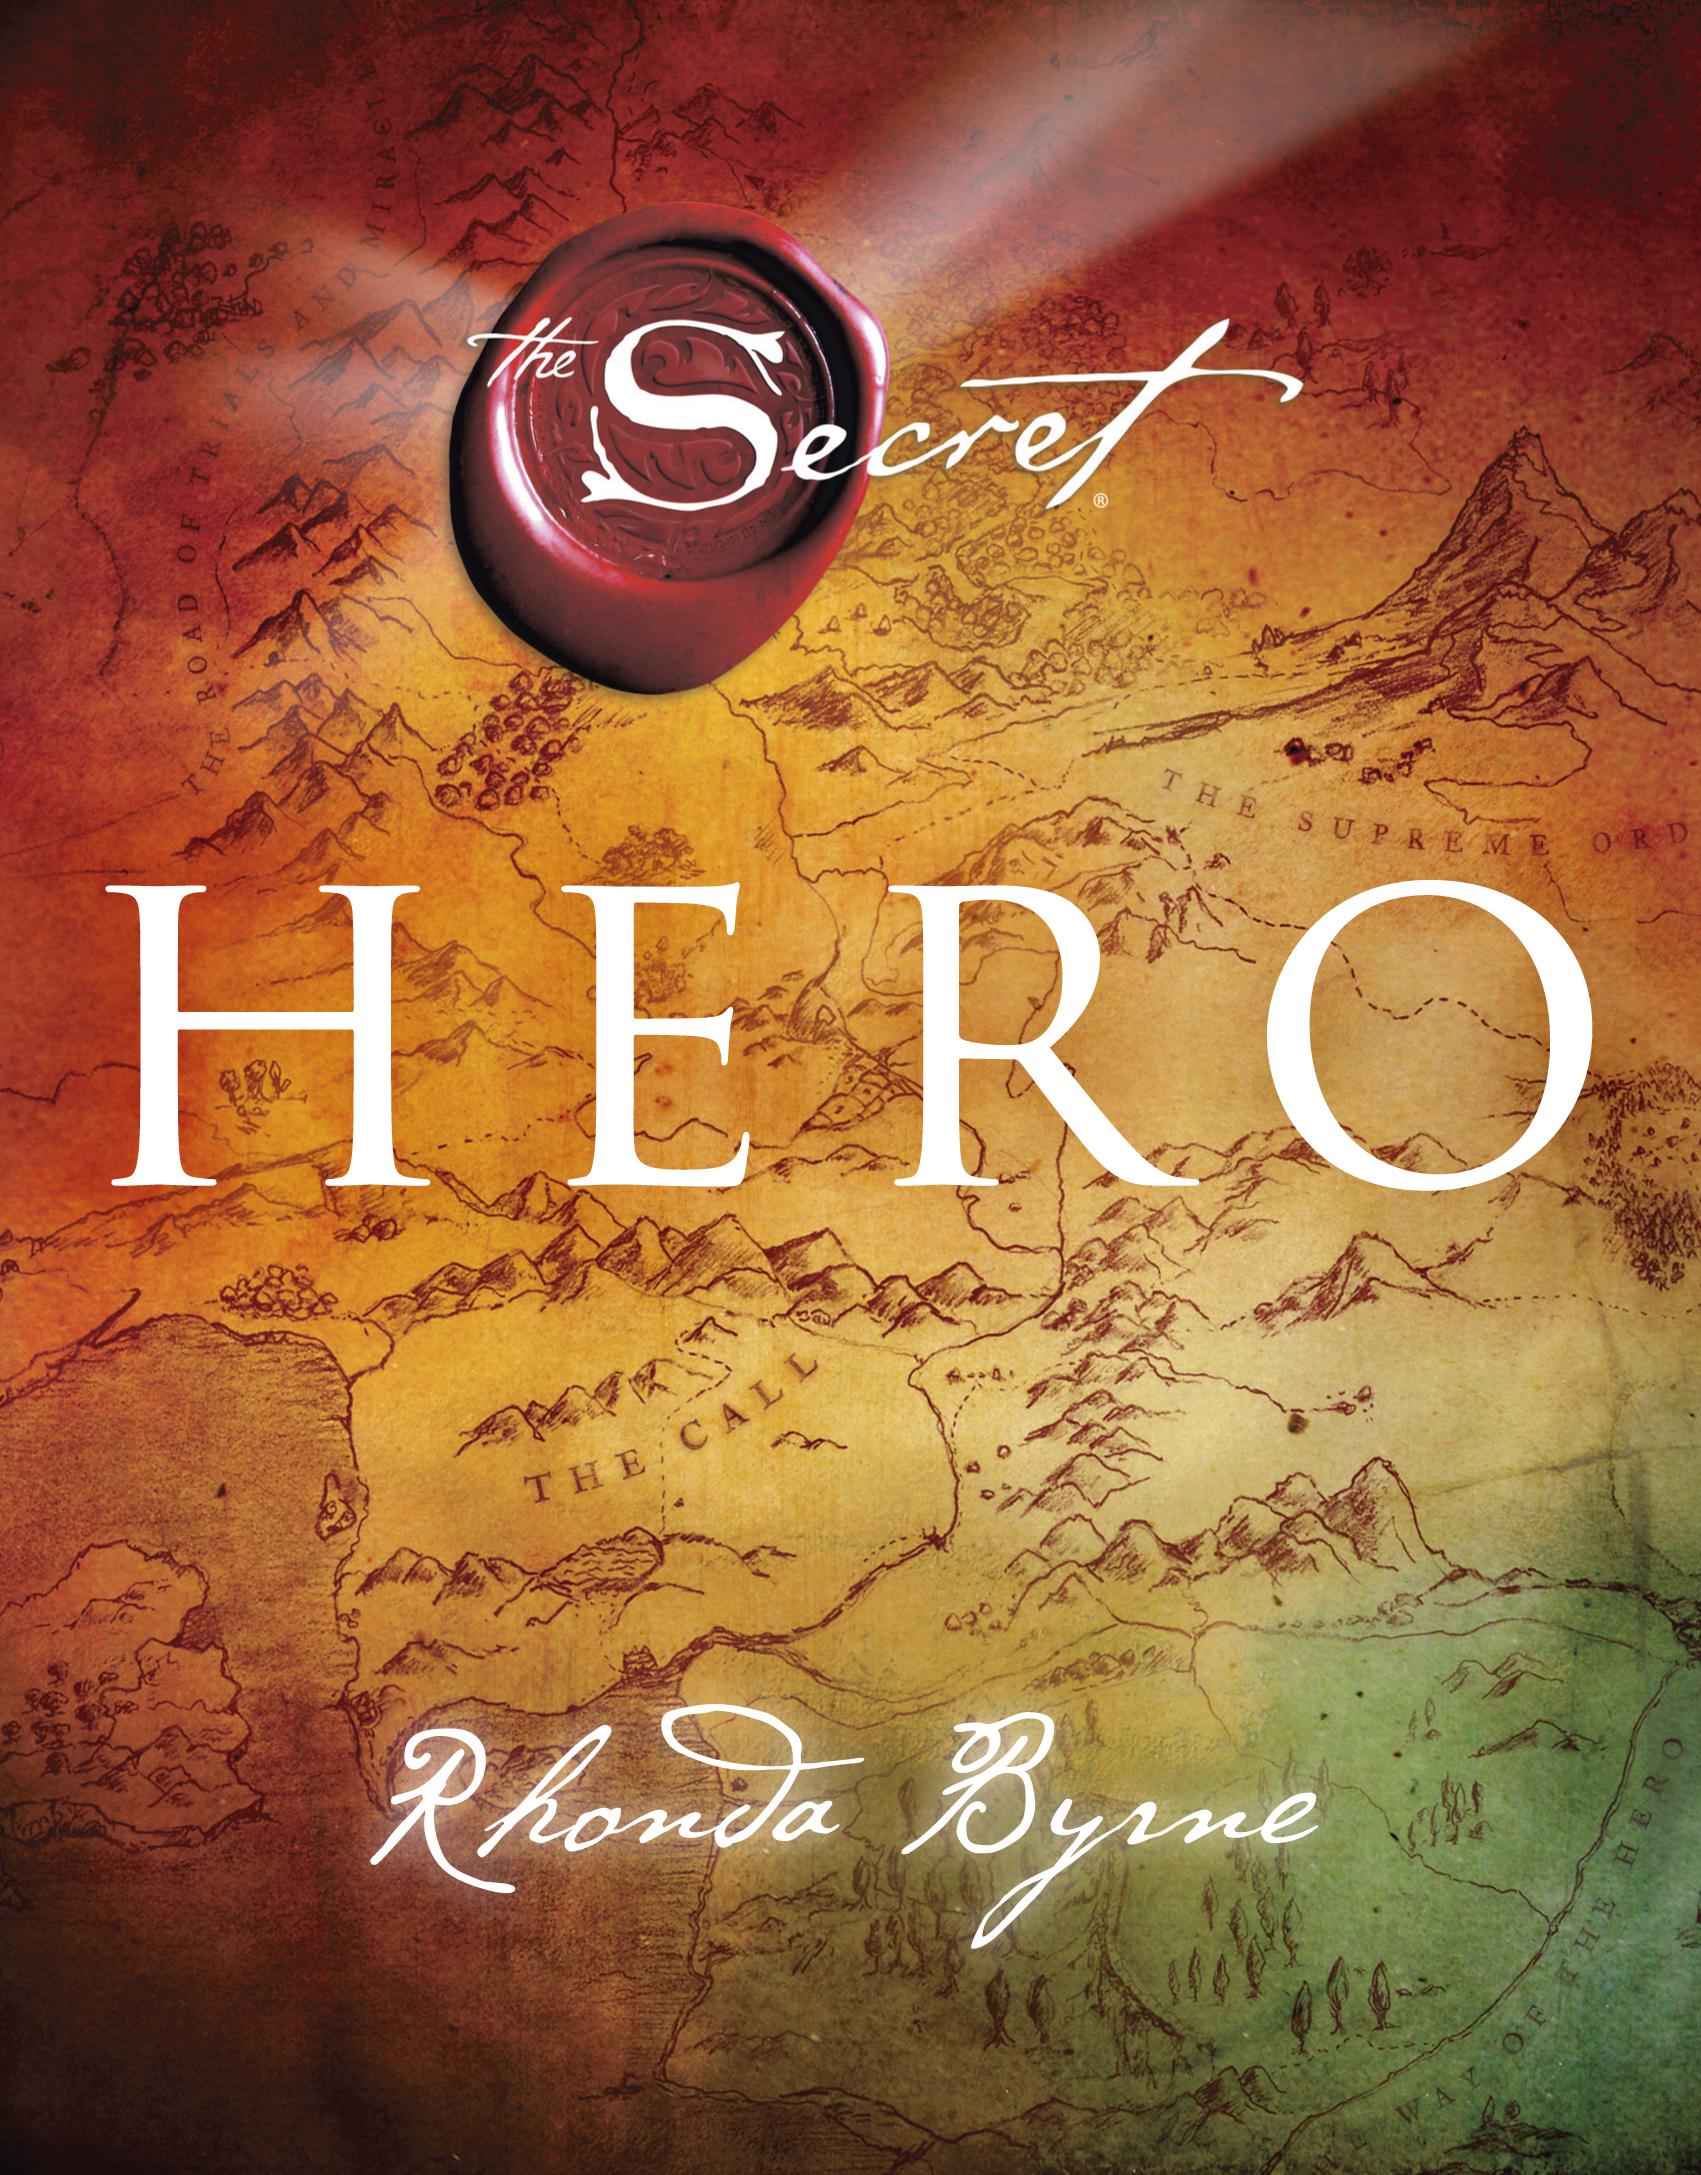 Read e-book the secret rhonda byrne [pdf free download].